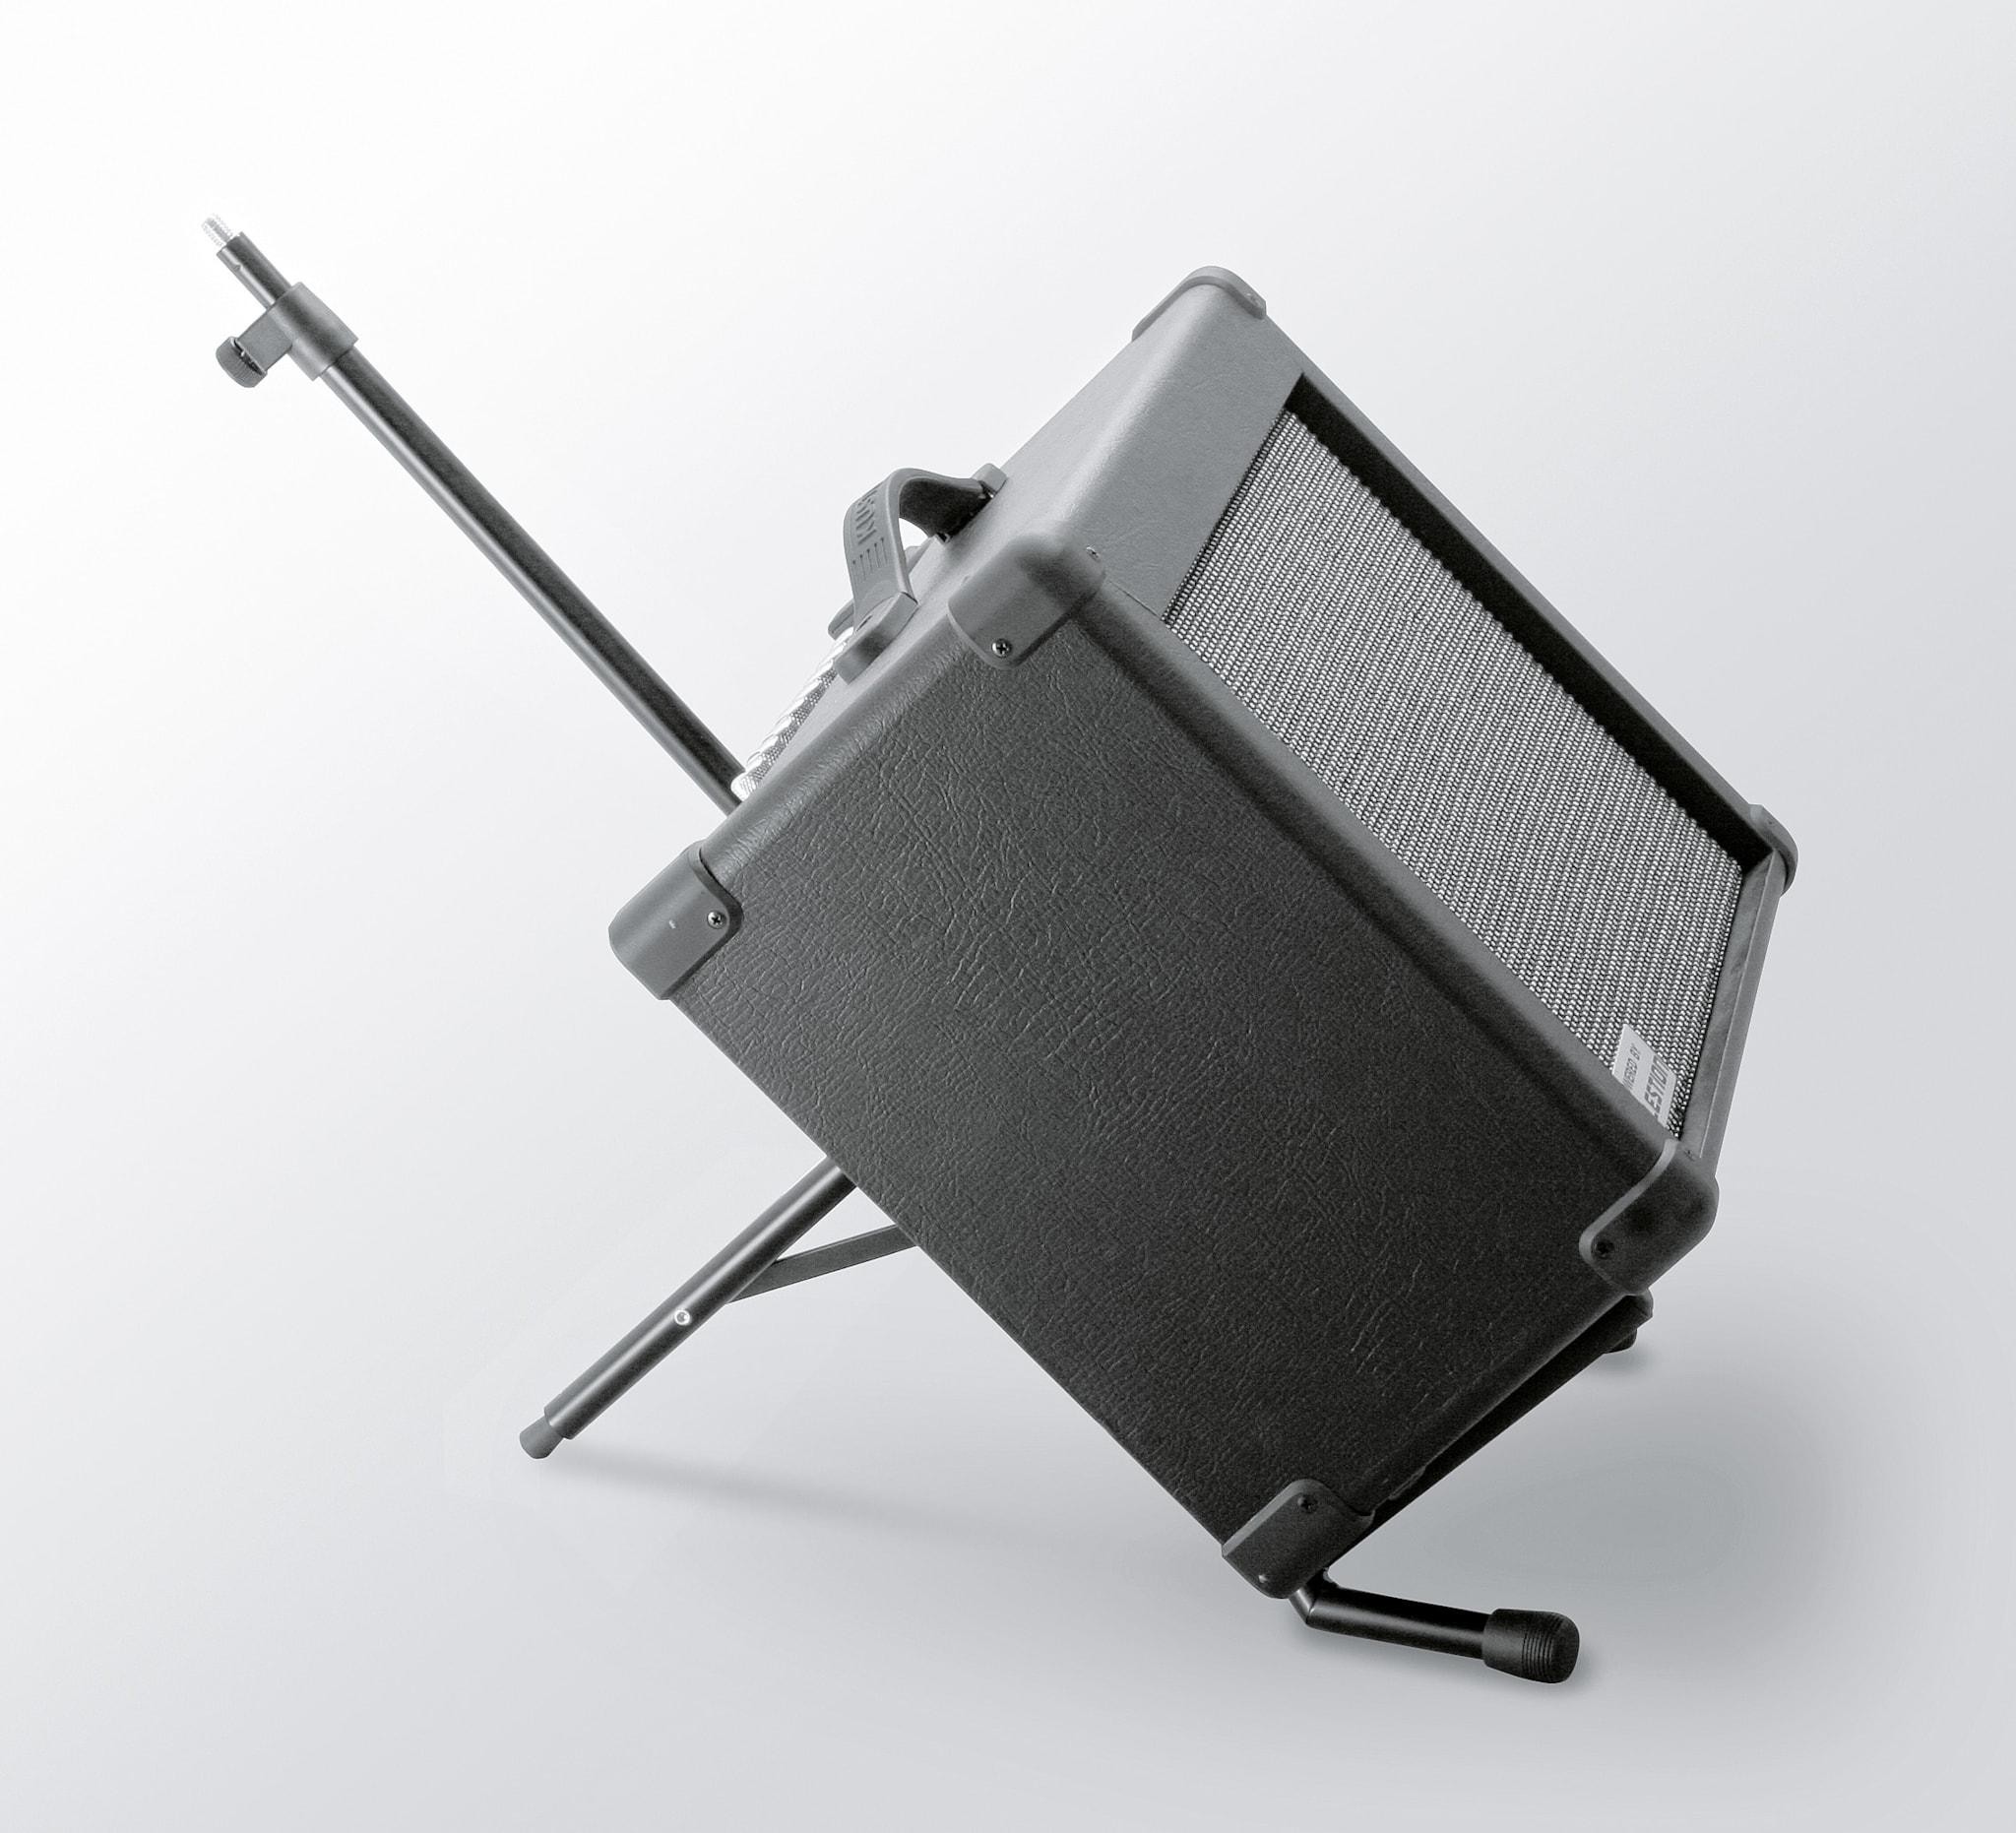 KM28130 - Amp stand